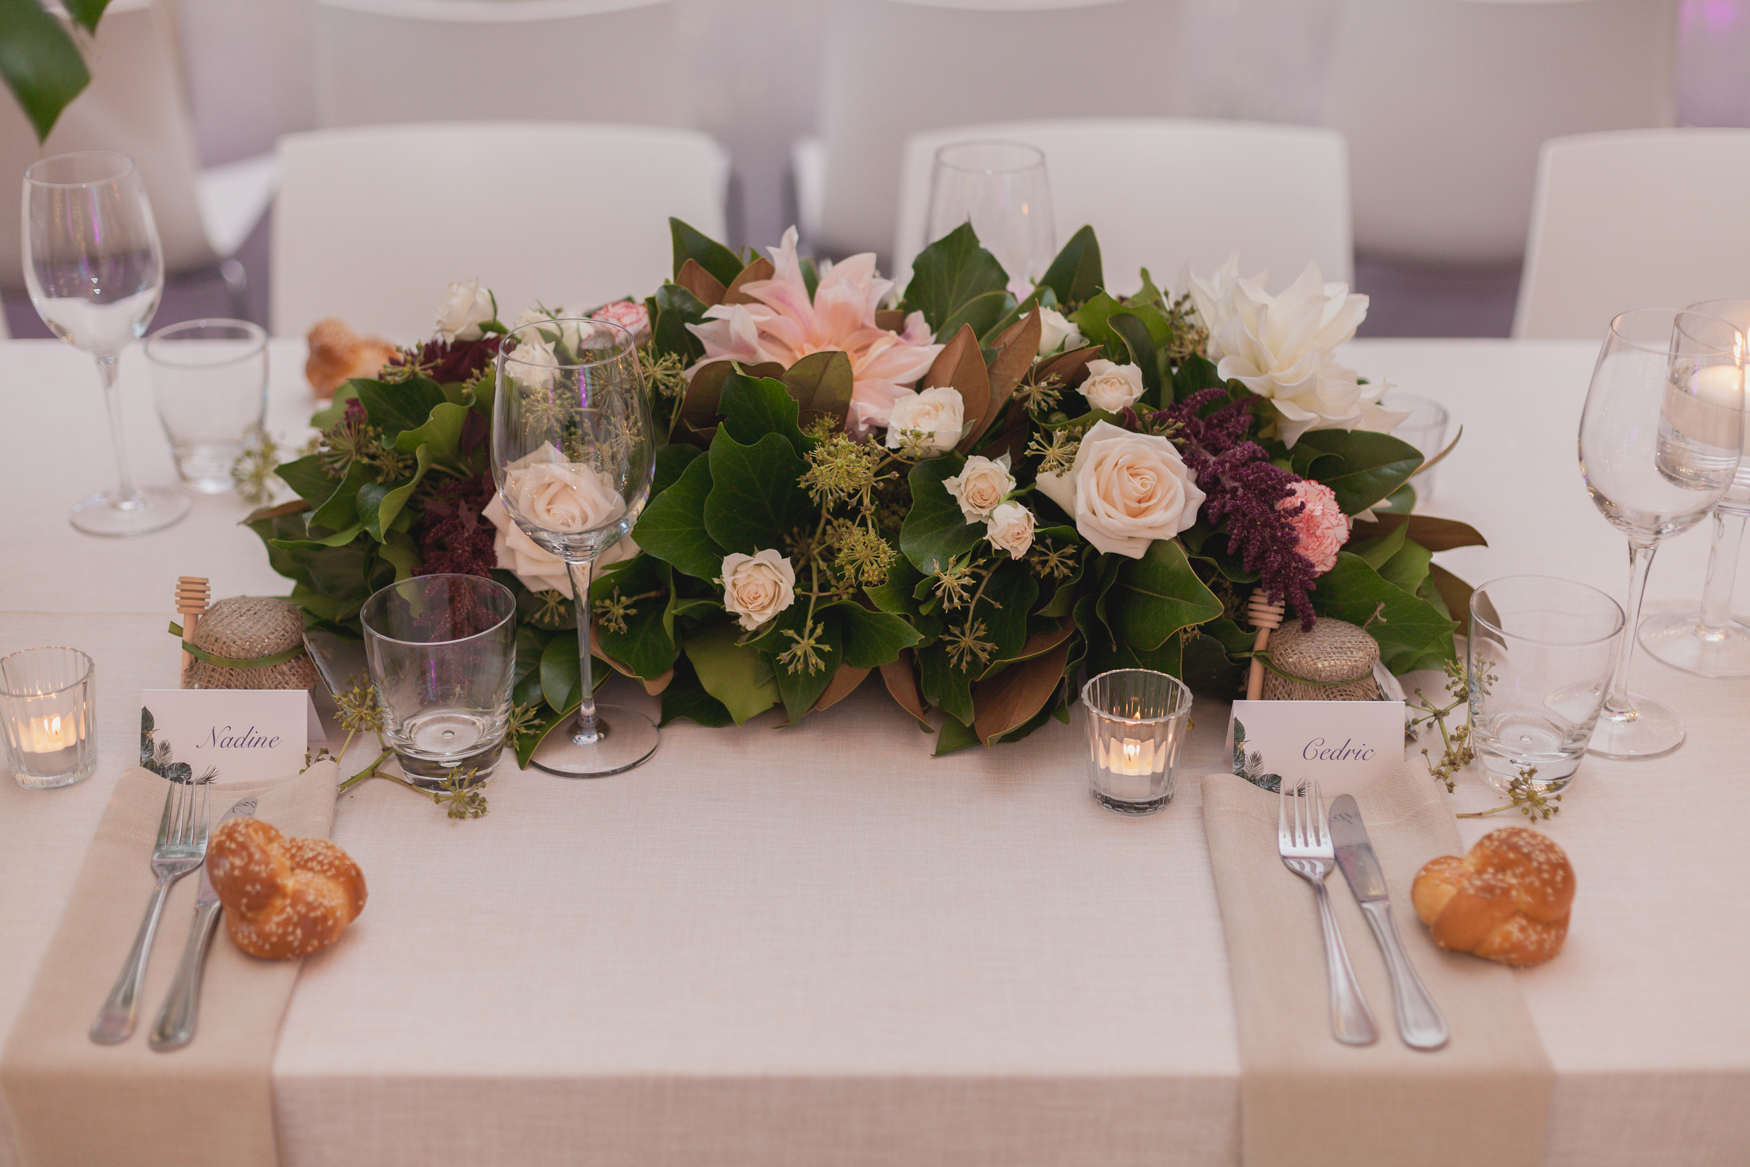 Leon_&_Martine's_Wedding_Photographs_17th_April_2019_@johnhenryweddingphoto_Low_Resolution_Web-441.JPG